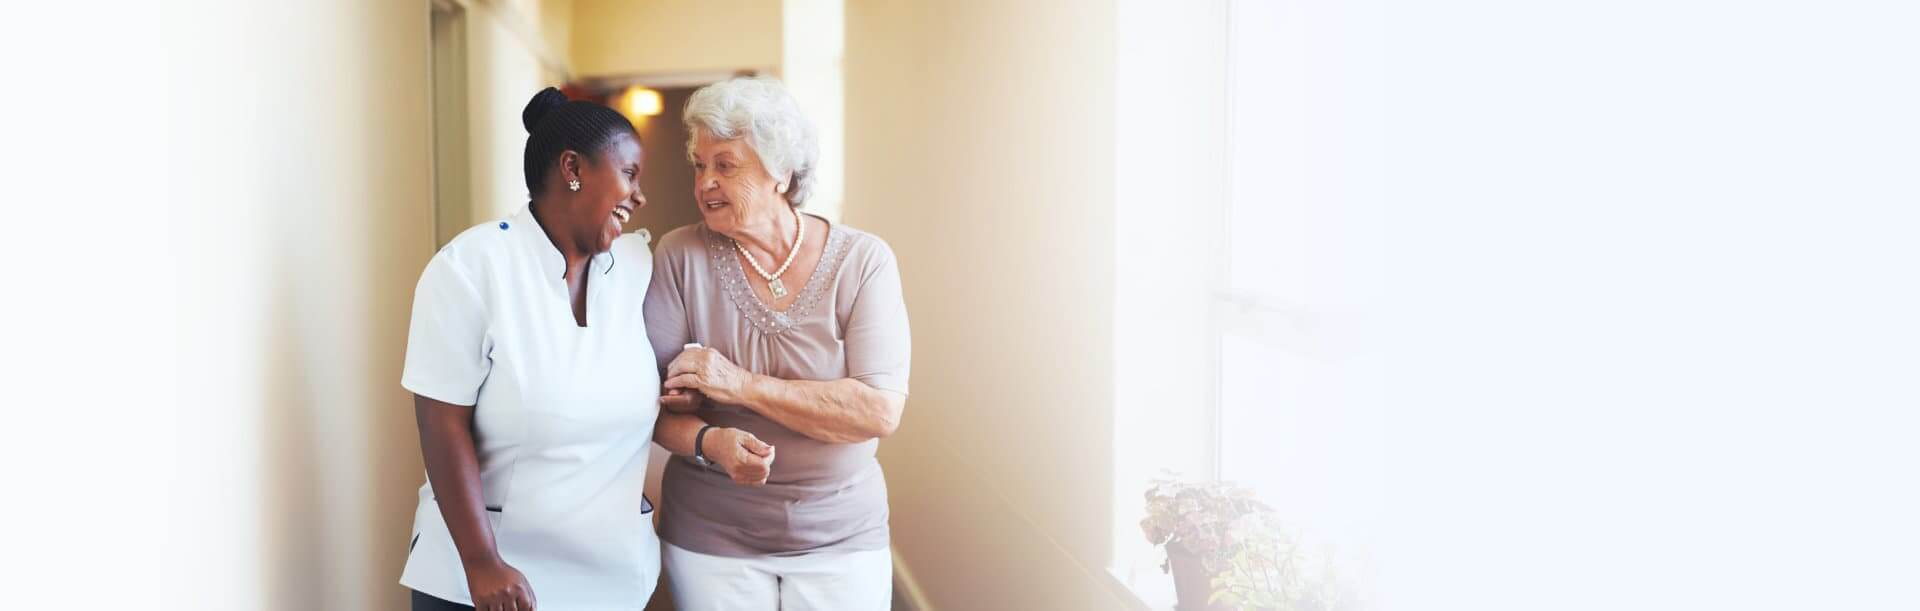 nurse walking with a senior woman